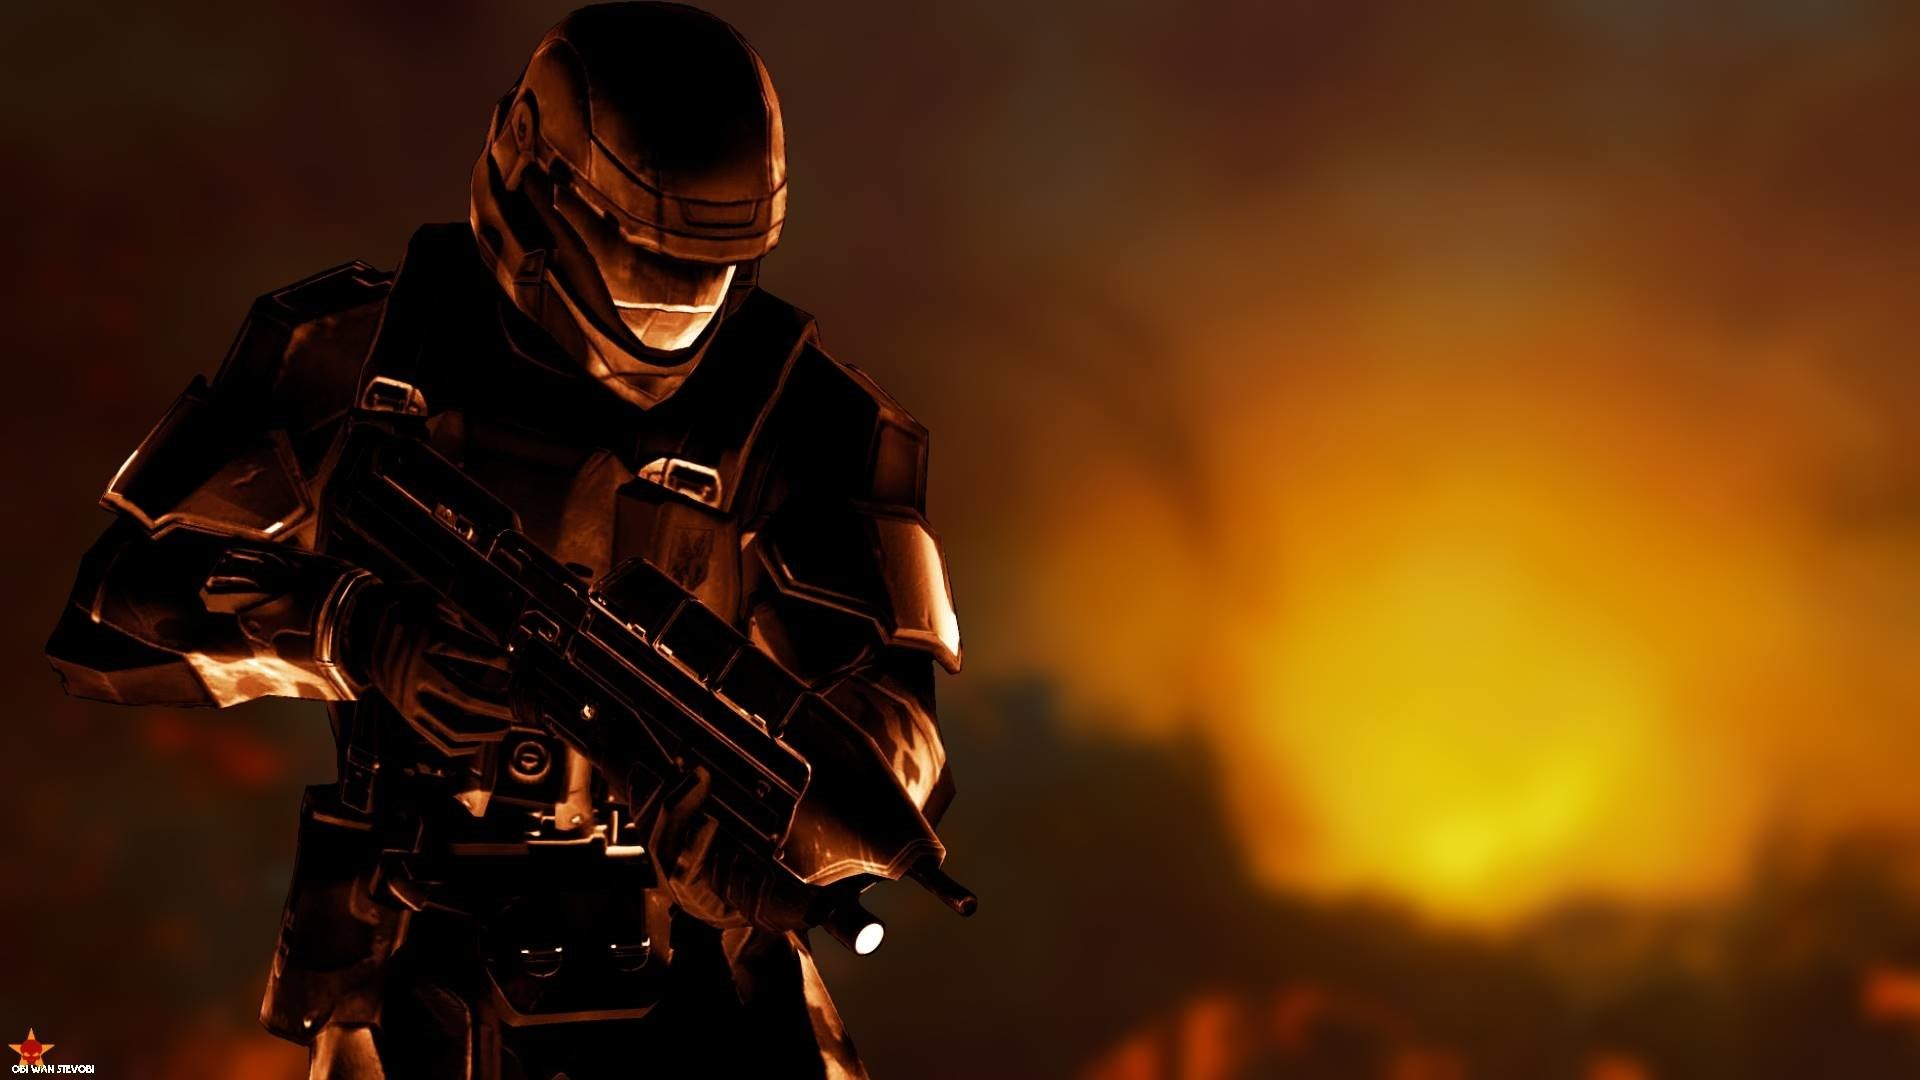 Halo 3 Wallpaper HD 1